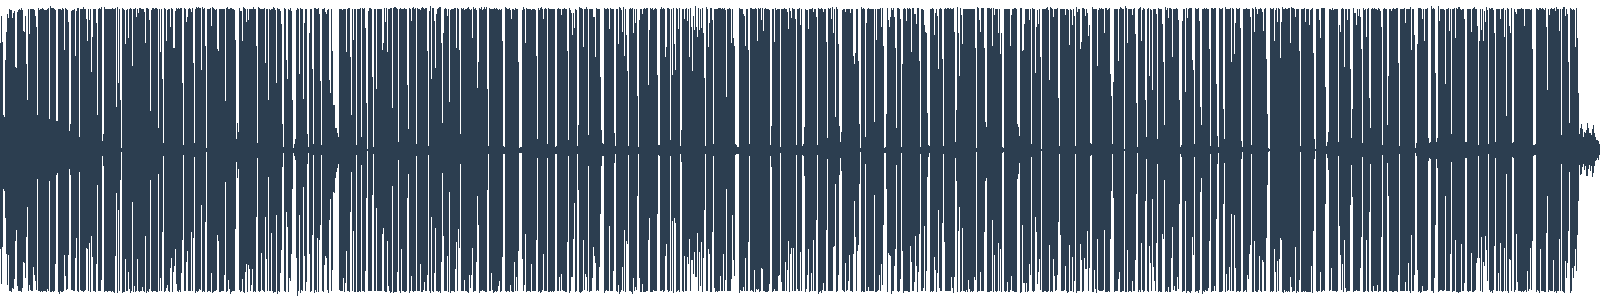 #19 Lyrizovaná próza - Naturizmus (Maturita s Hashtagom) waveform